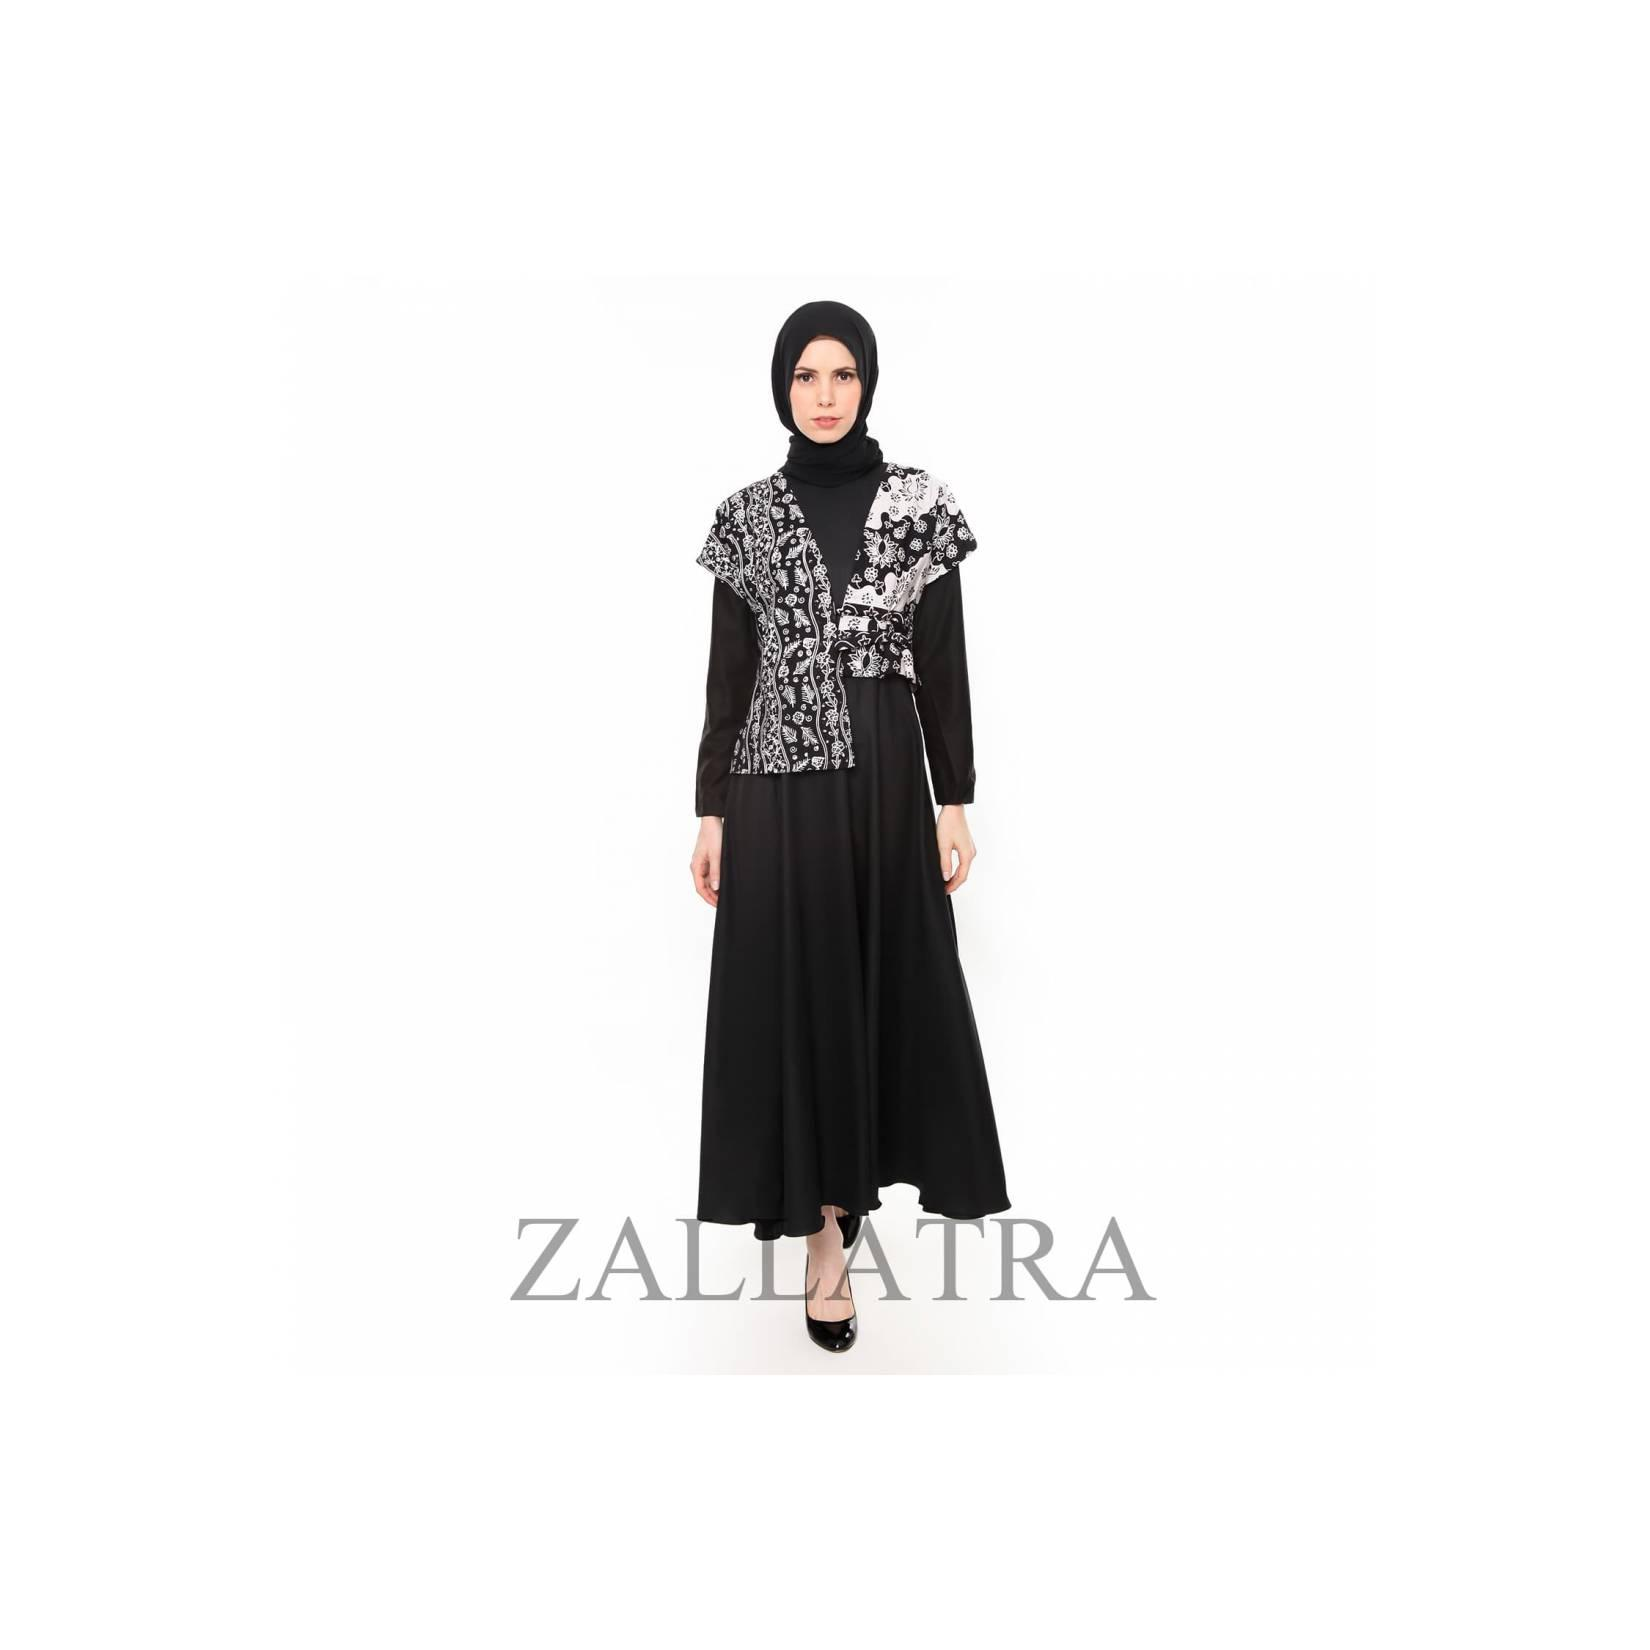 Gamis Batik Wanita Asli Jambi Berkualias - Zallatra GM05